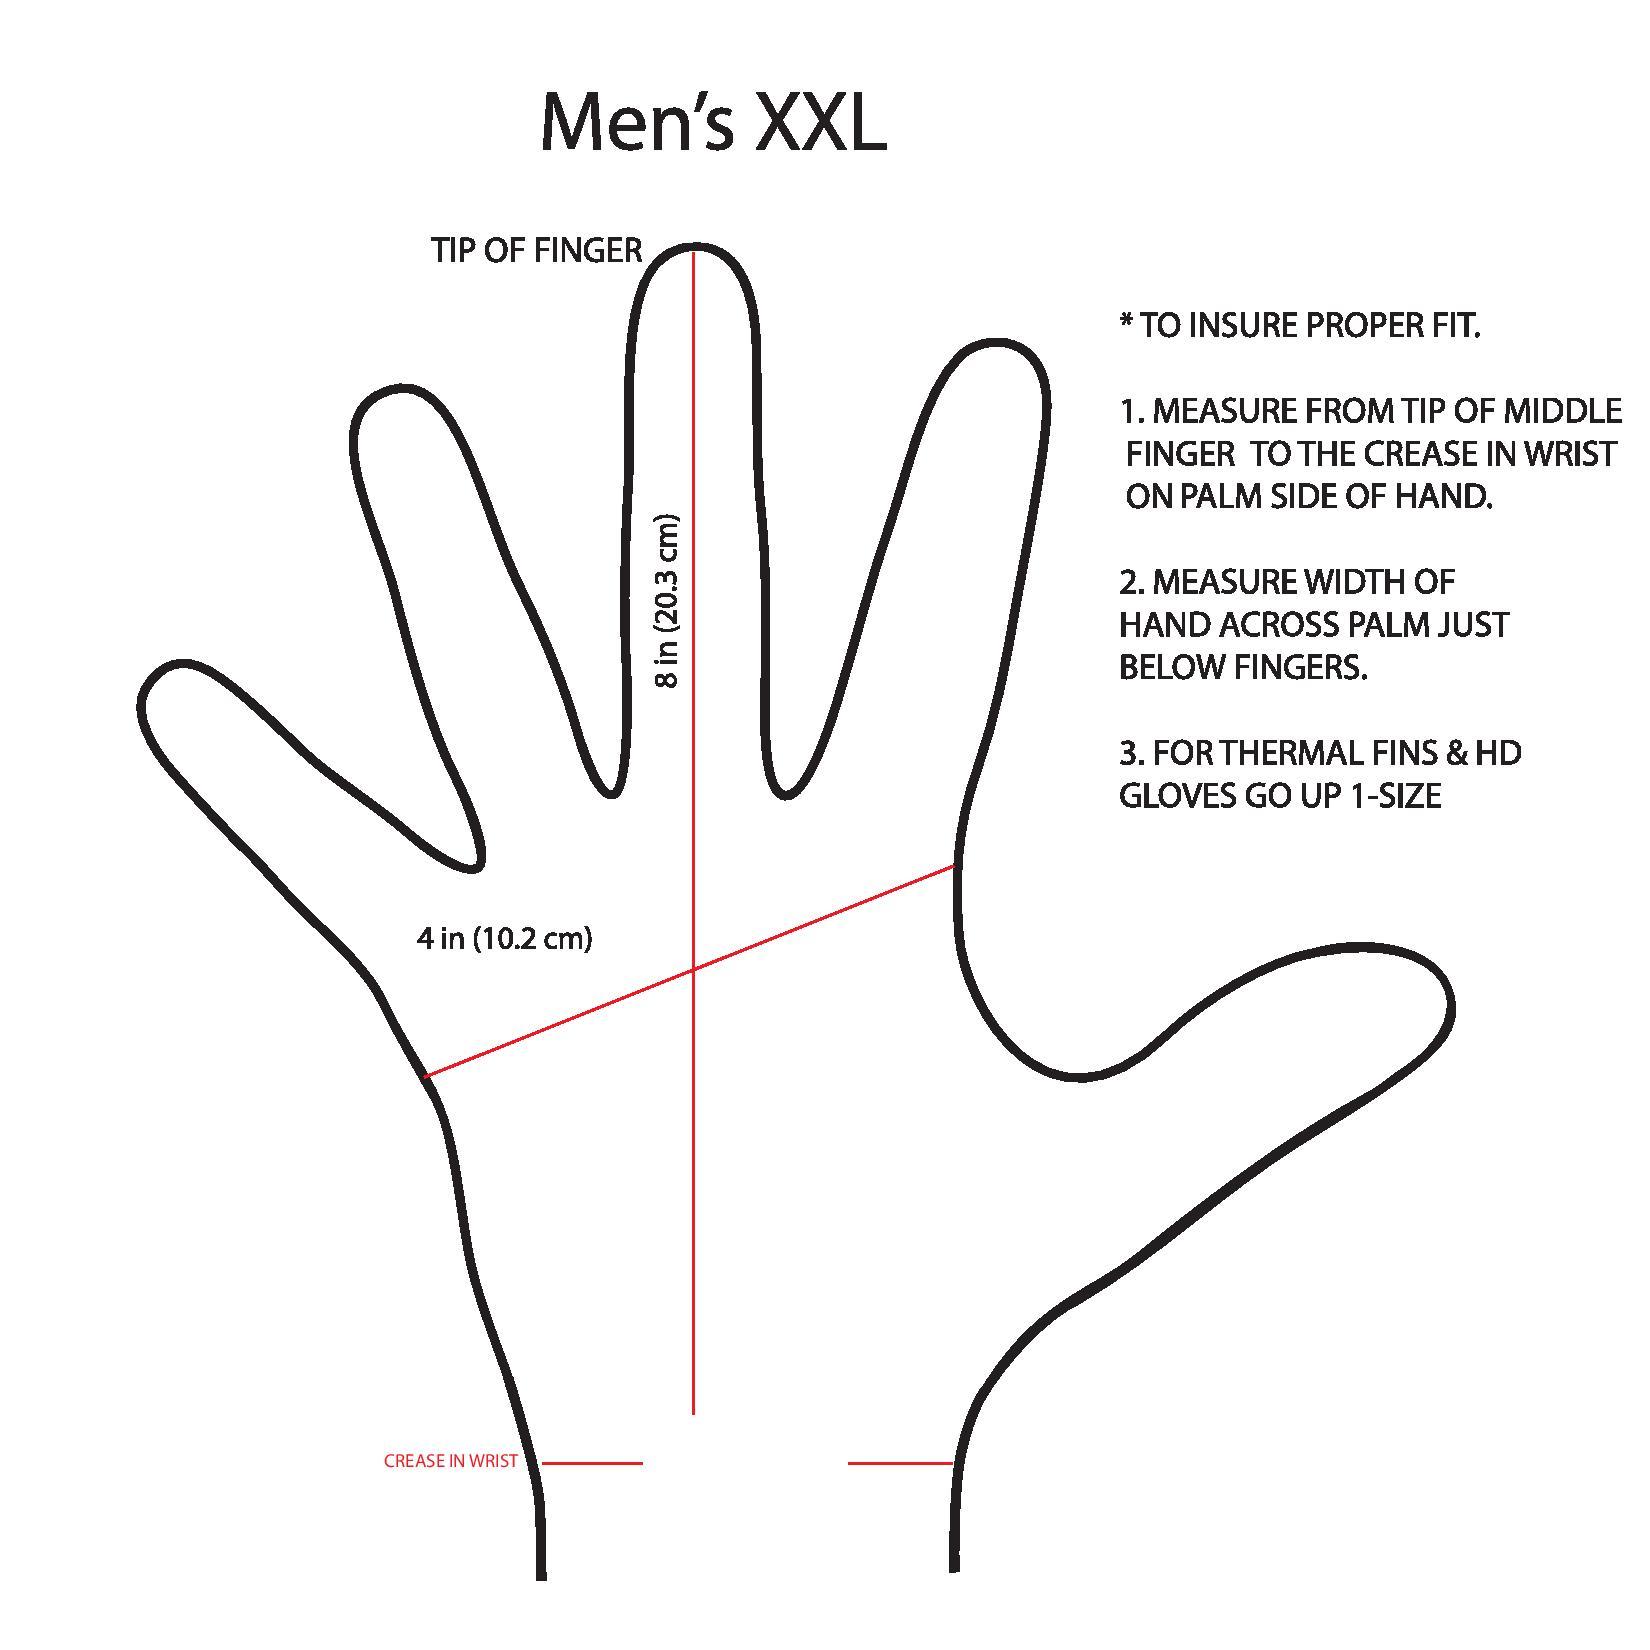 men-s-xxl-page-001-2-.jpg